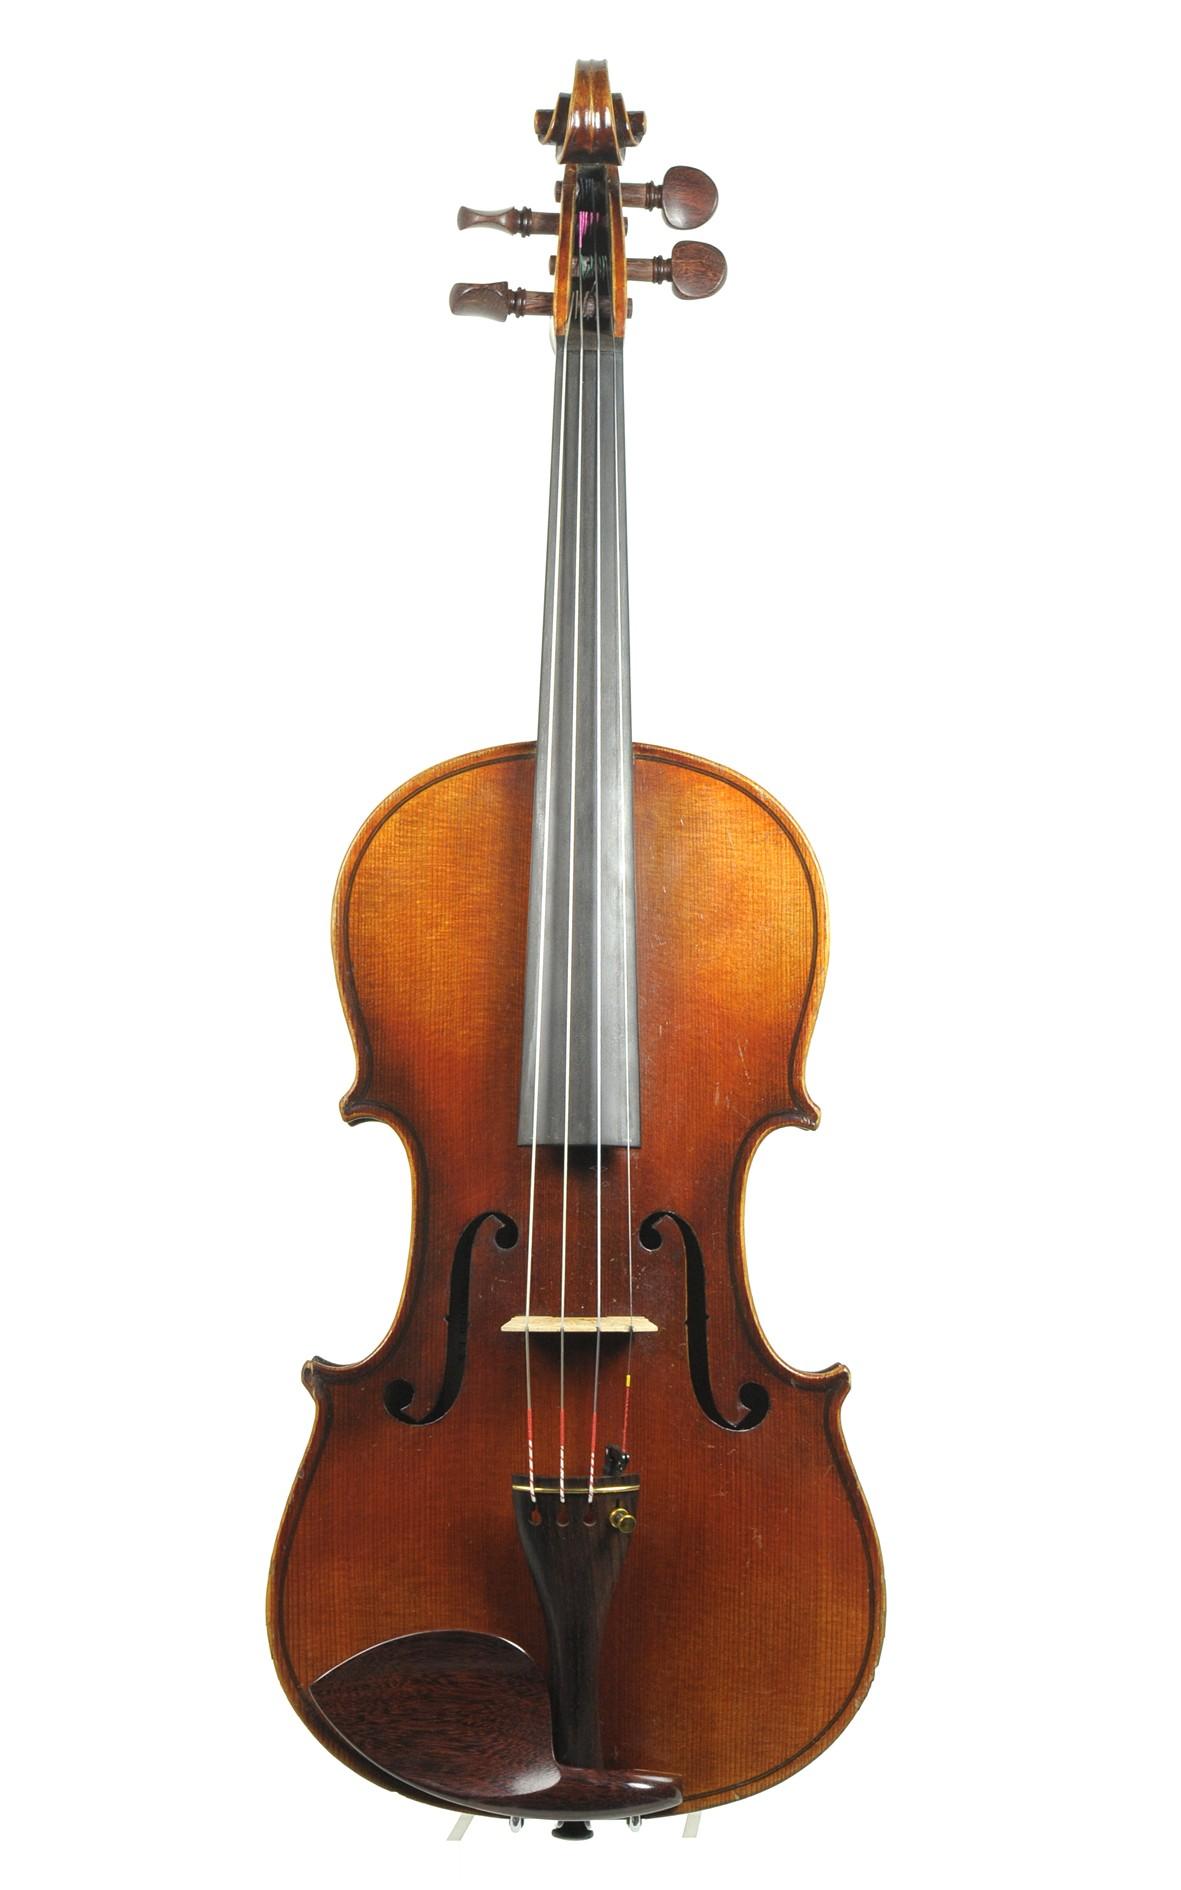 August Clemens Glier, Markneukirchen, violin approx. 1900 - top